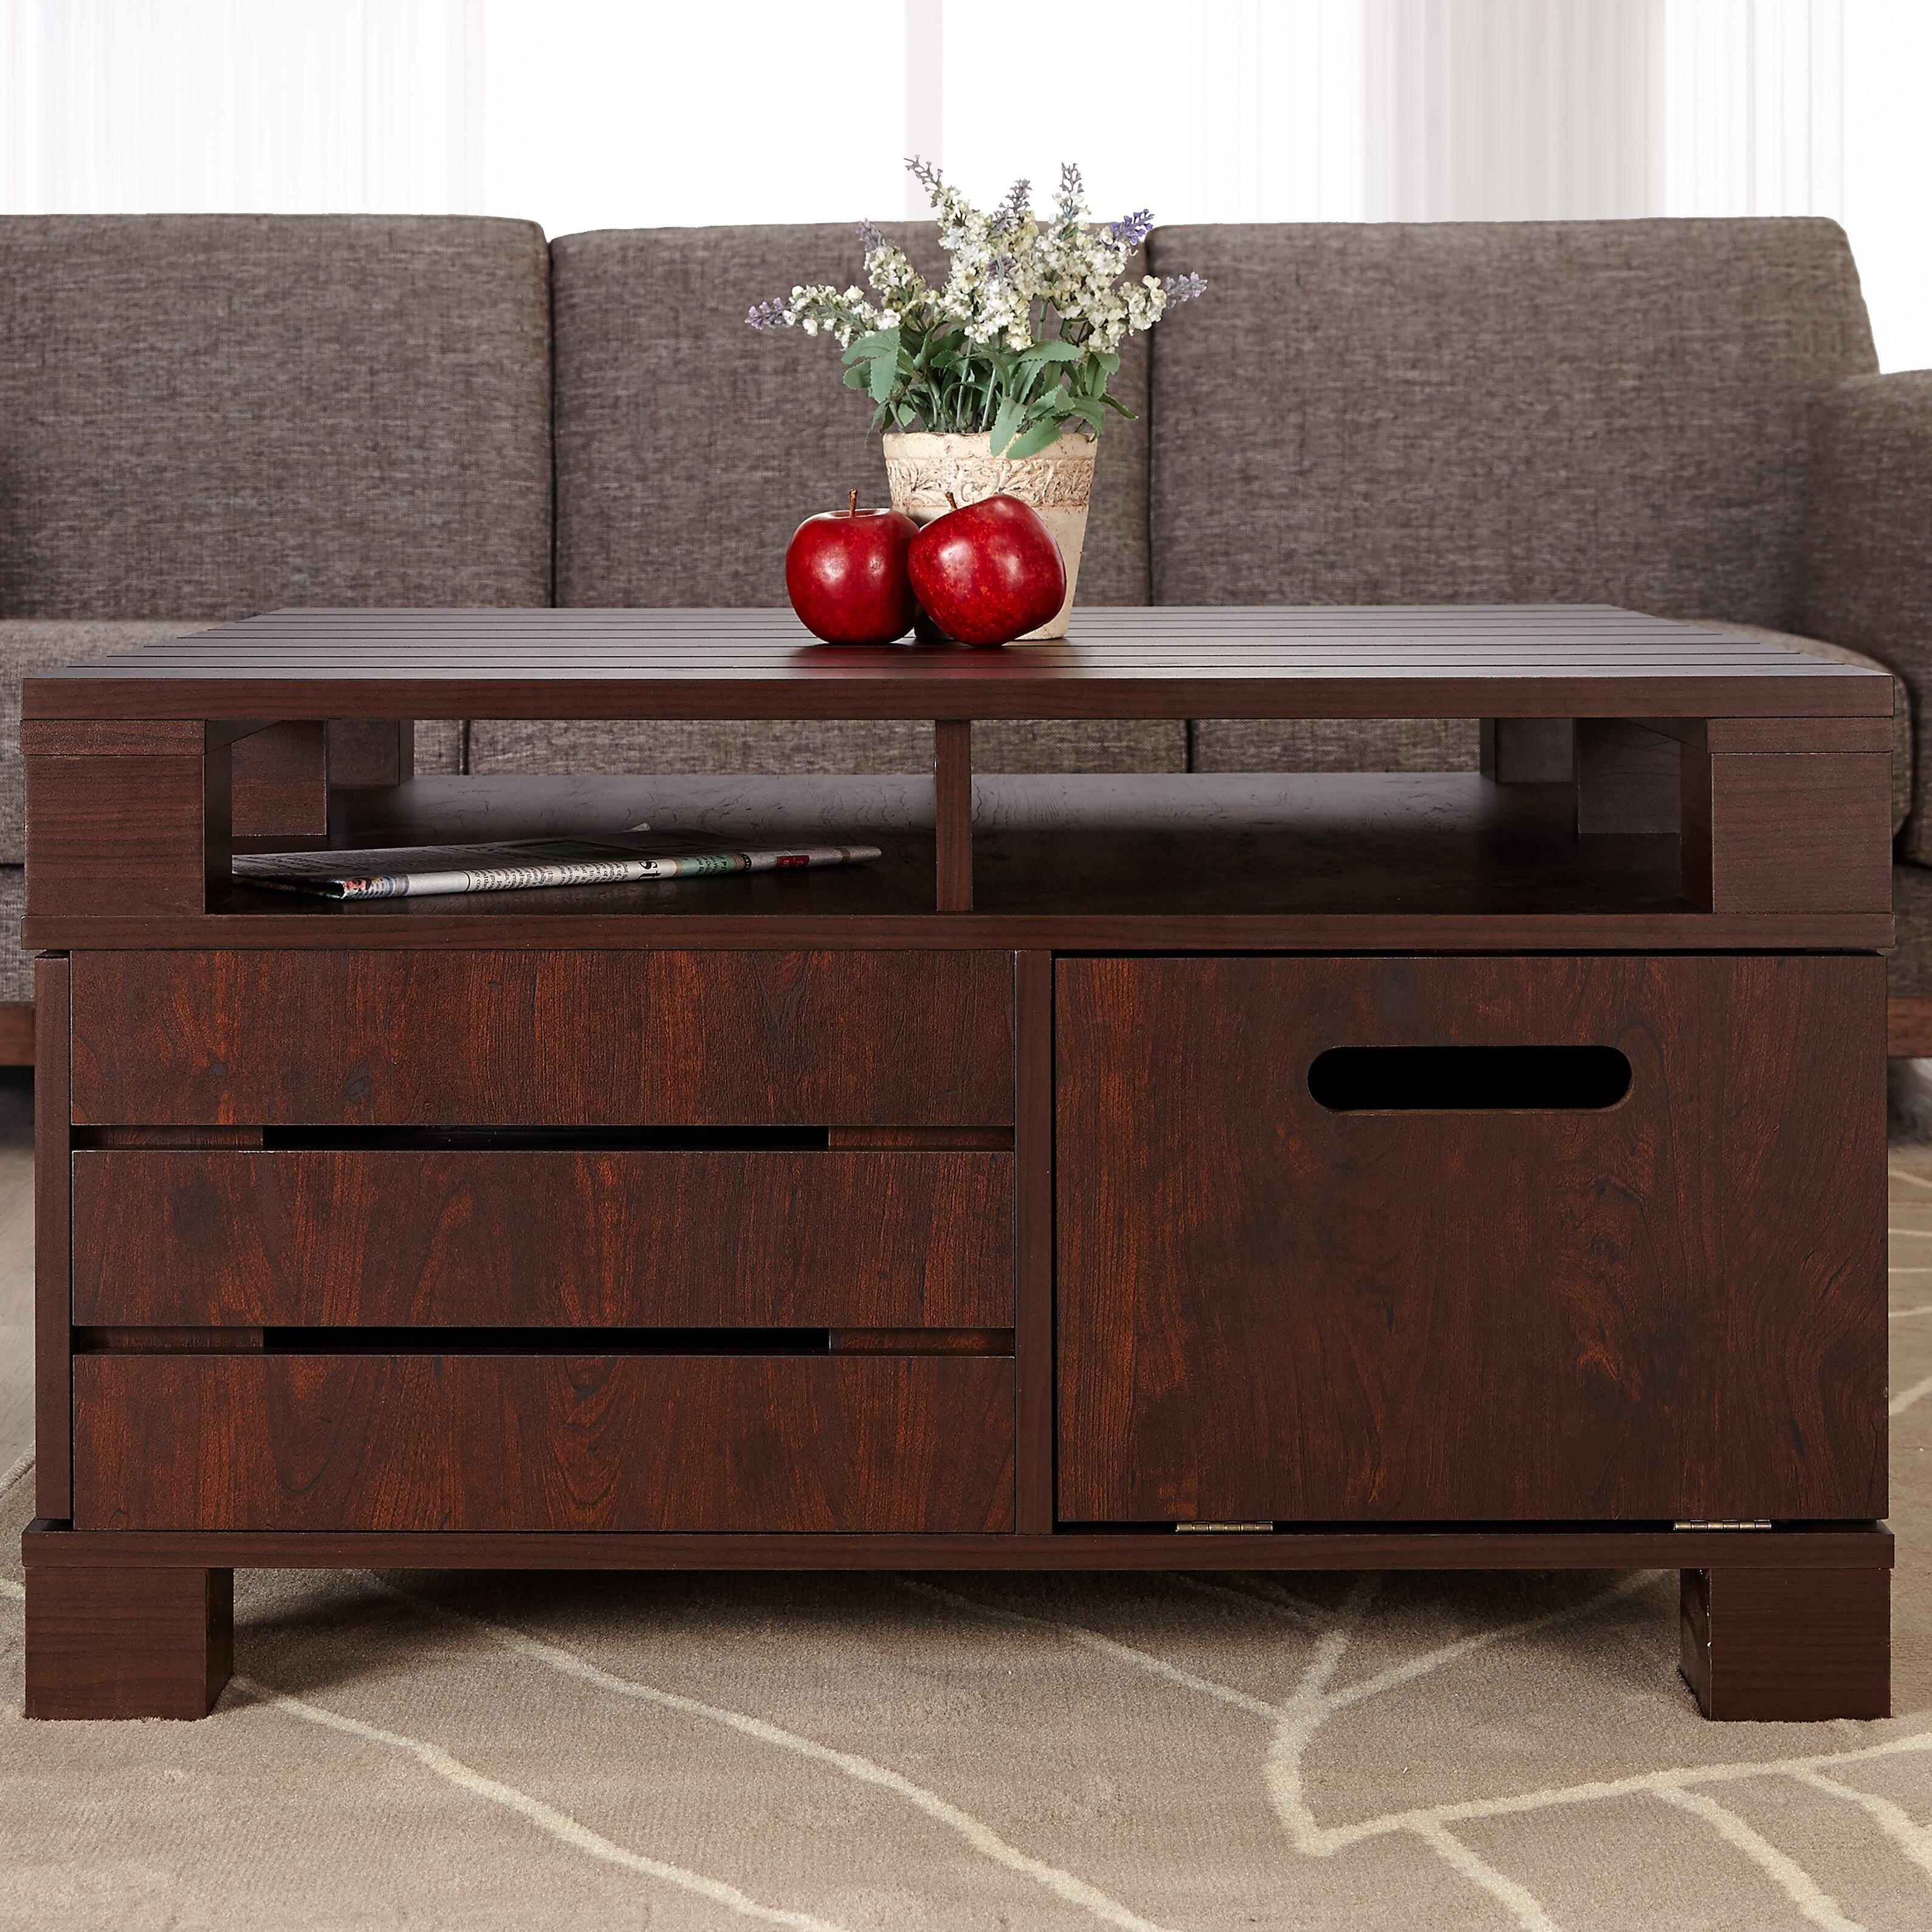 hokku coffee table - hokku coffee table